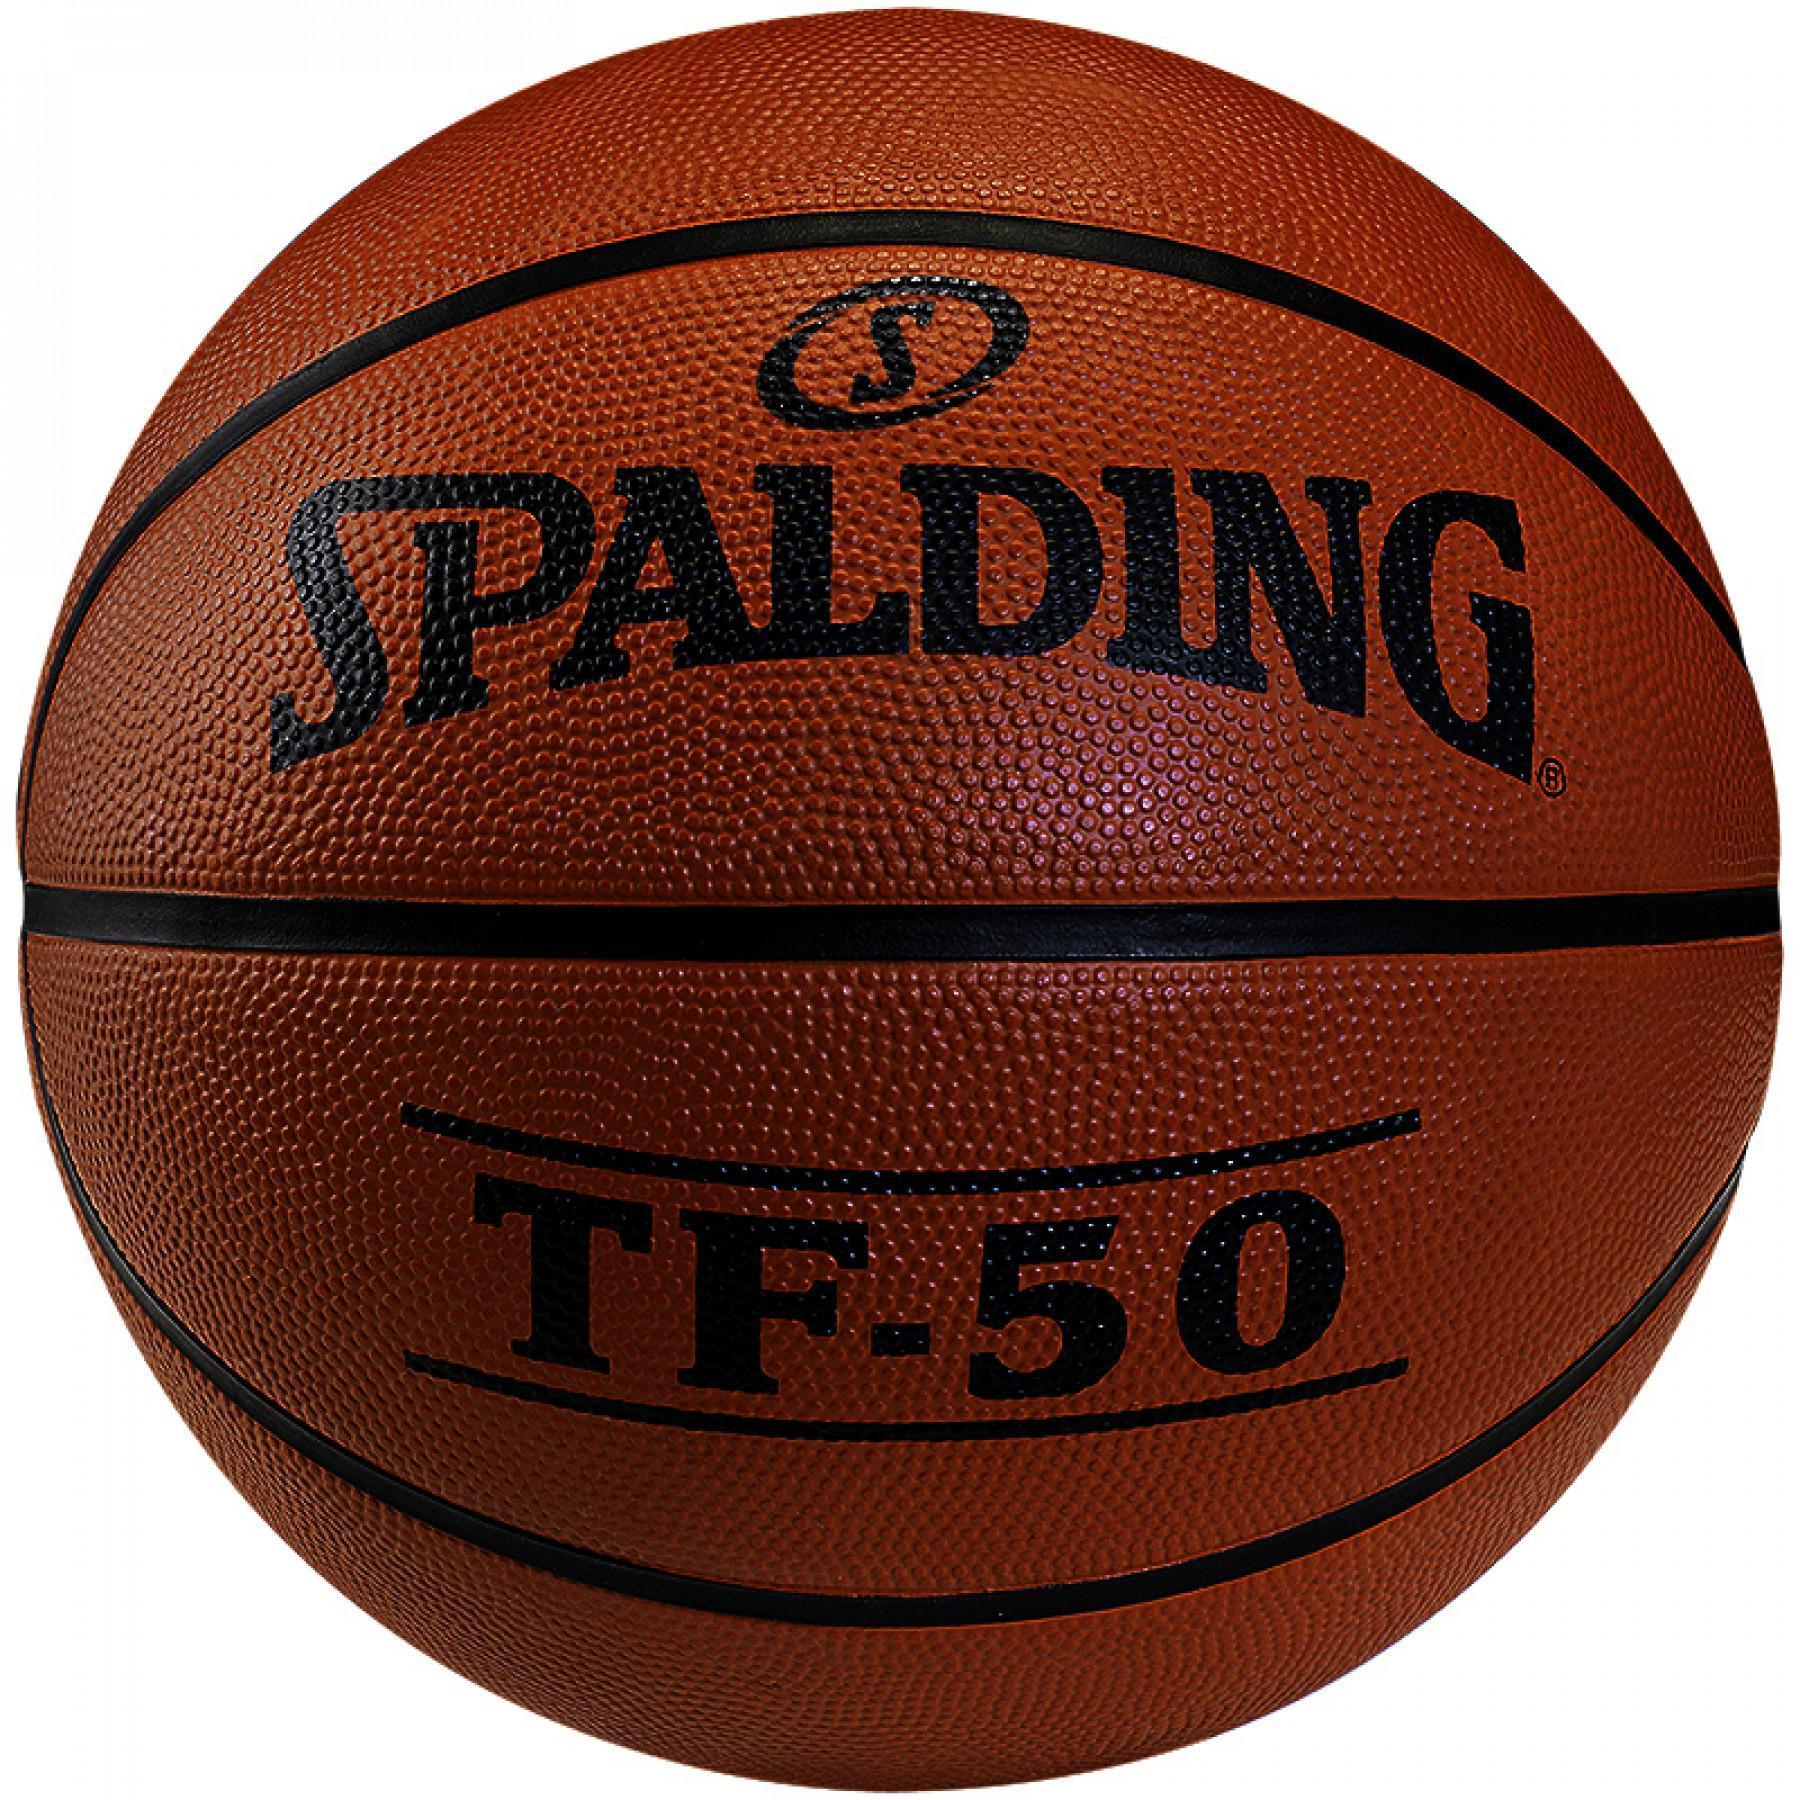 Balloon Spalding TF50 Outdoor